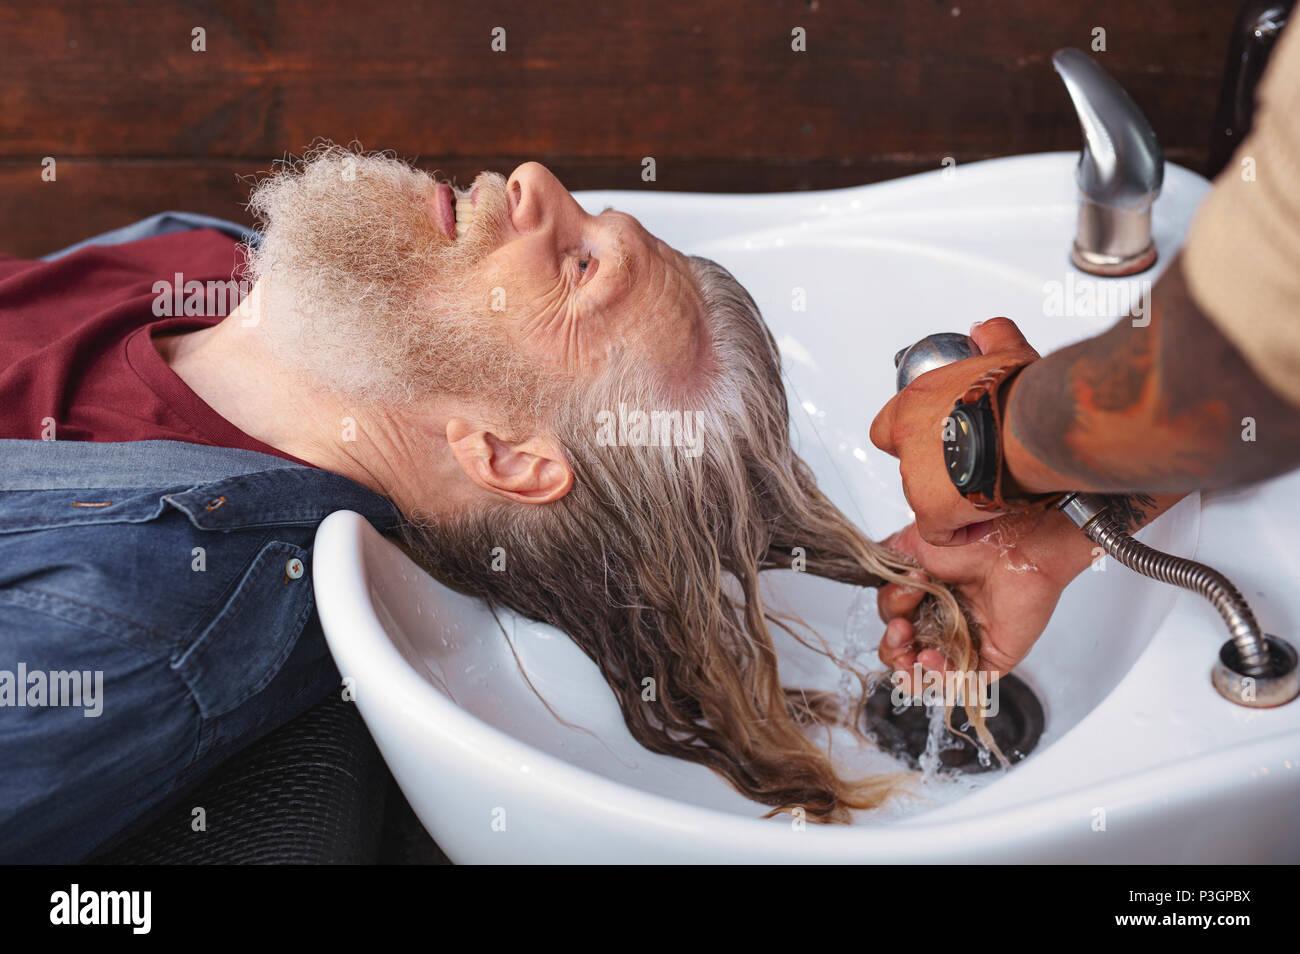 Joyful male person spending weekend with pleasure - Stock Image